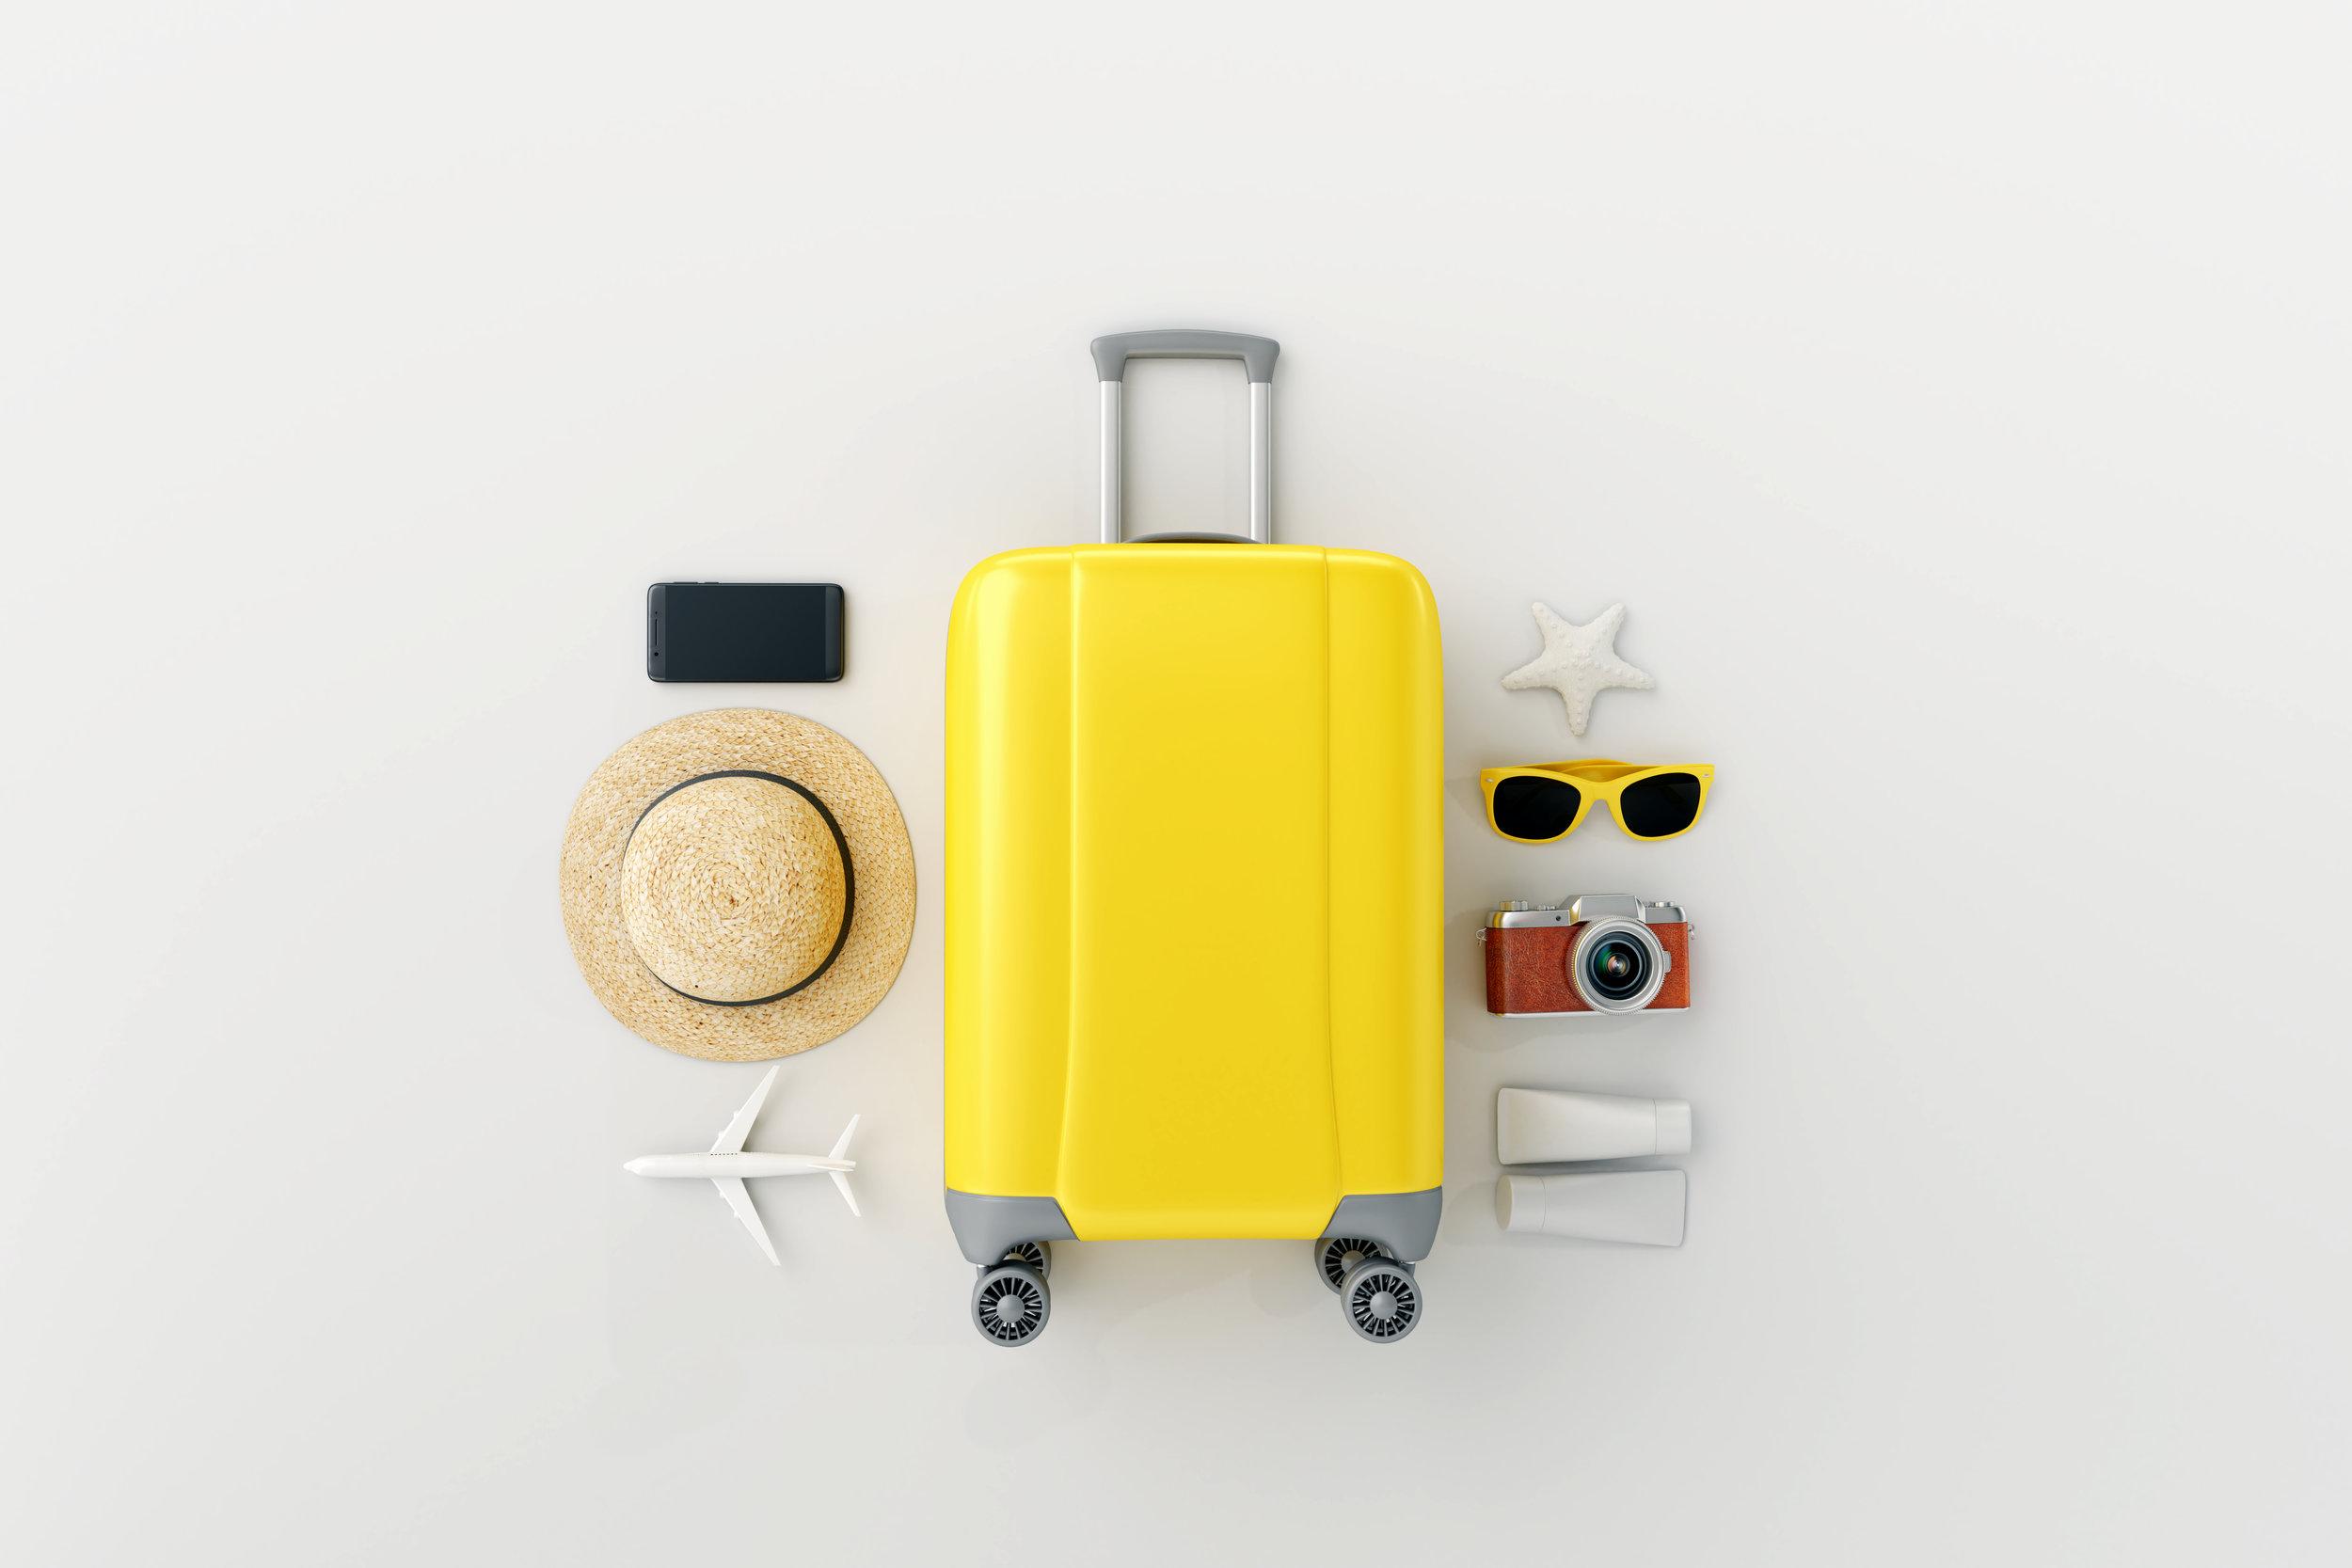 Ballywho-travel-social-instagram-facebook-management-charleston-sc